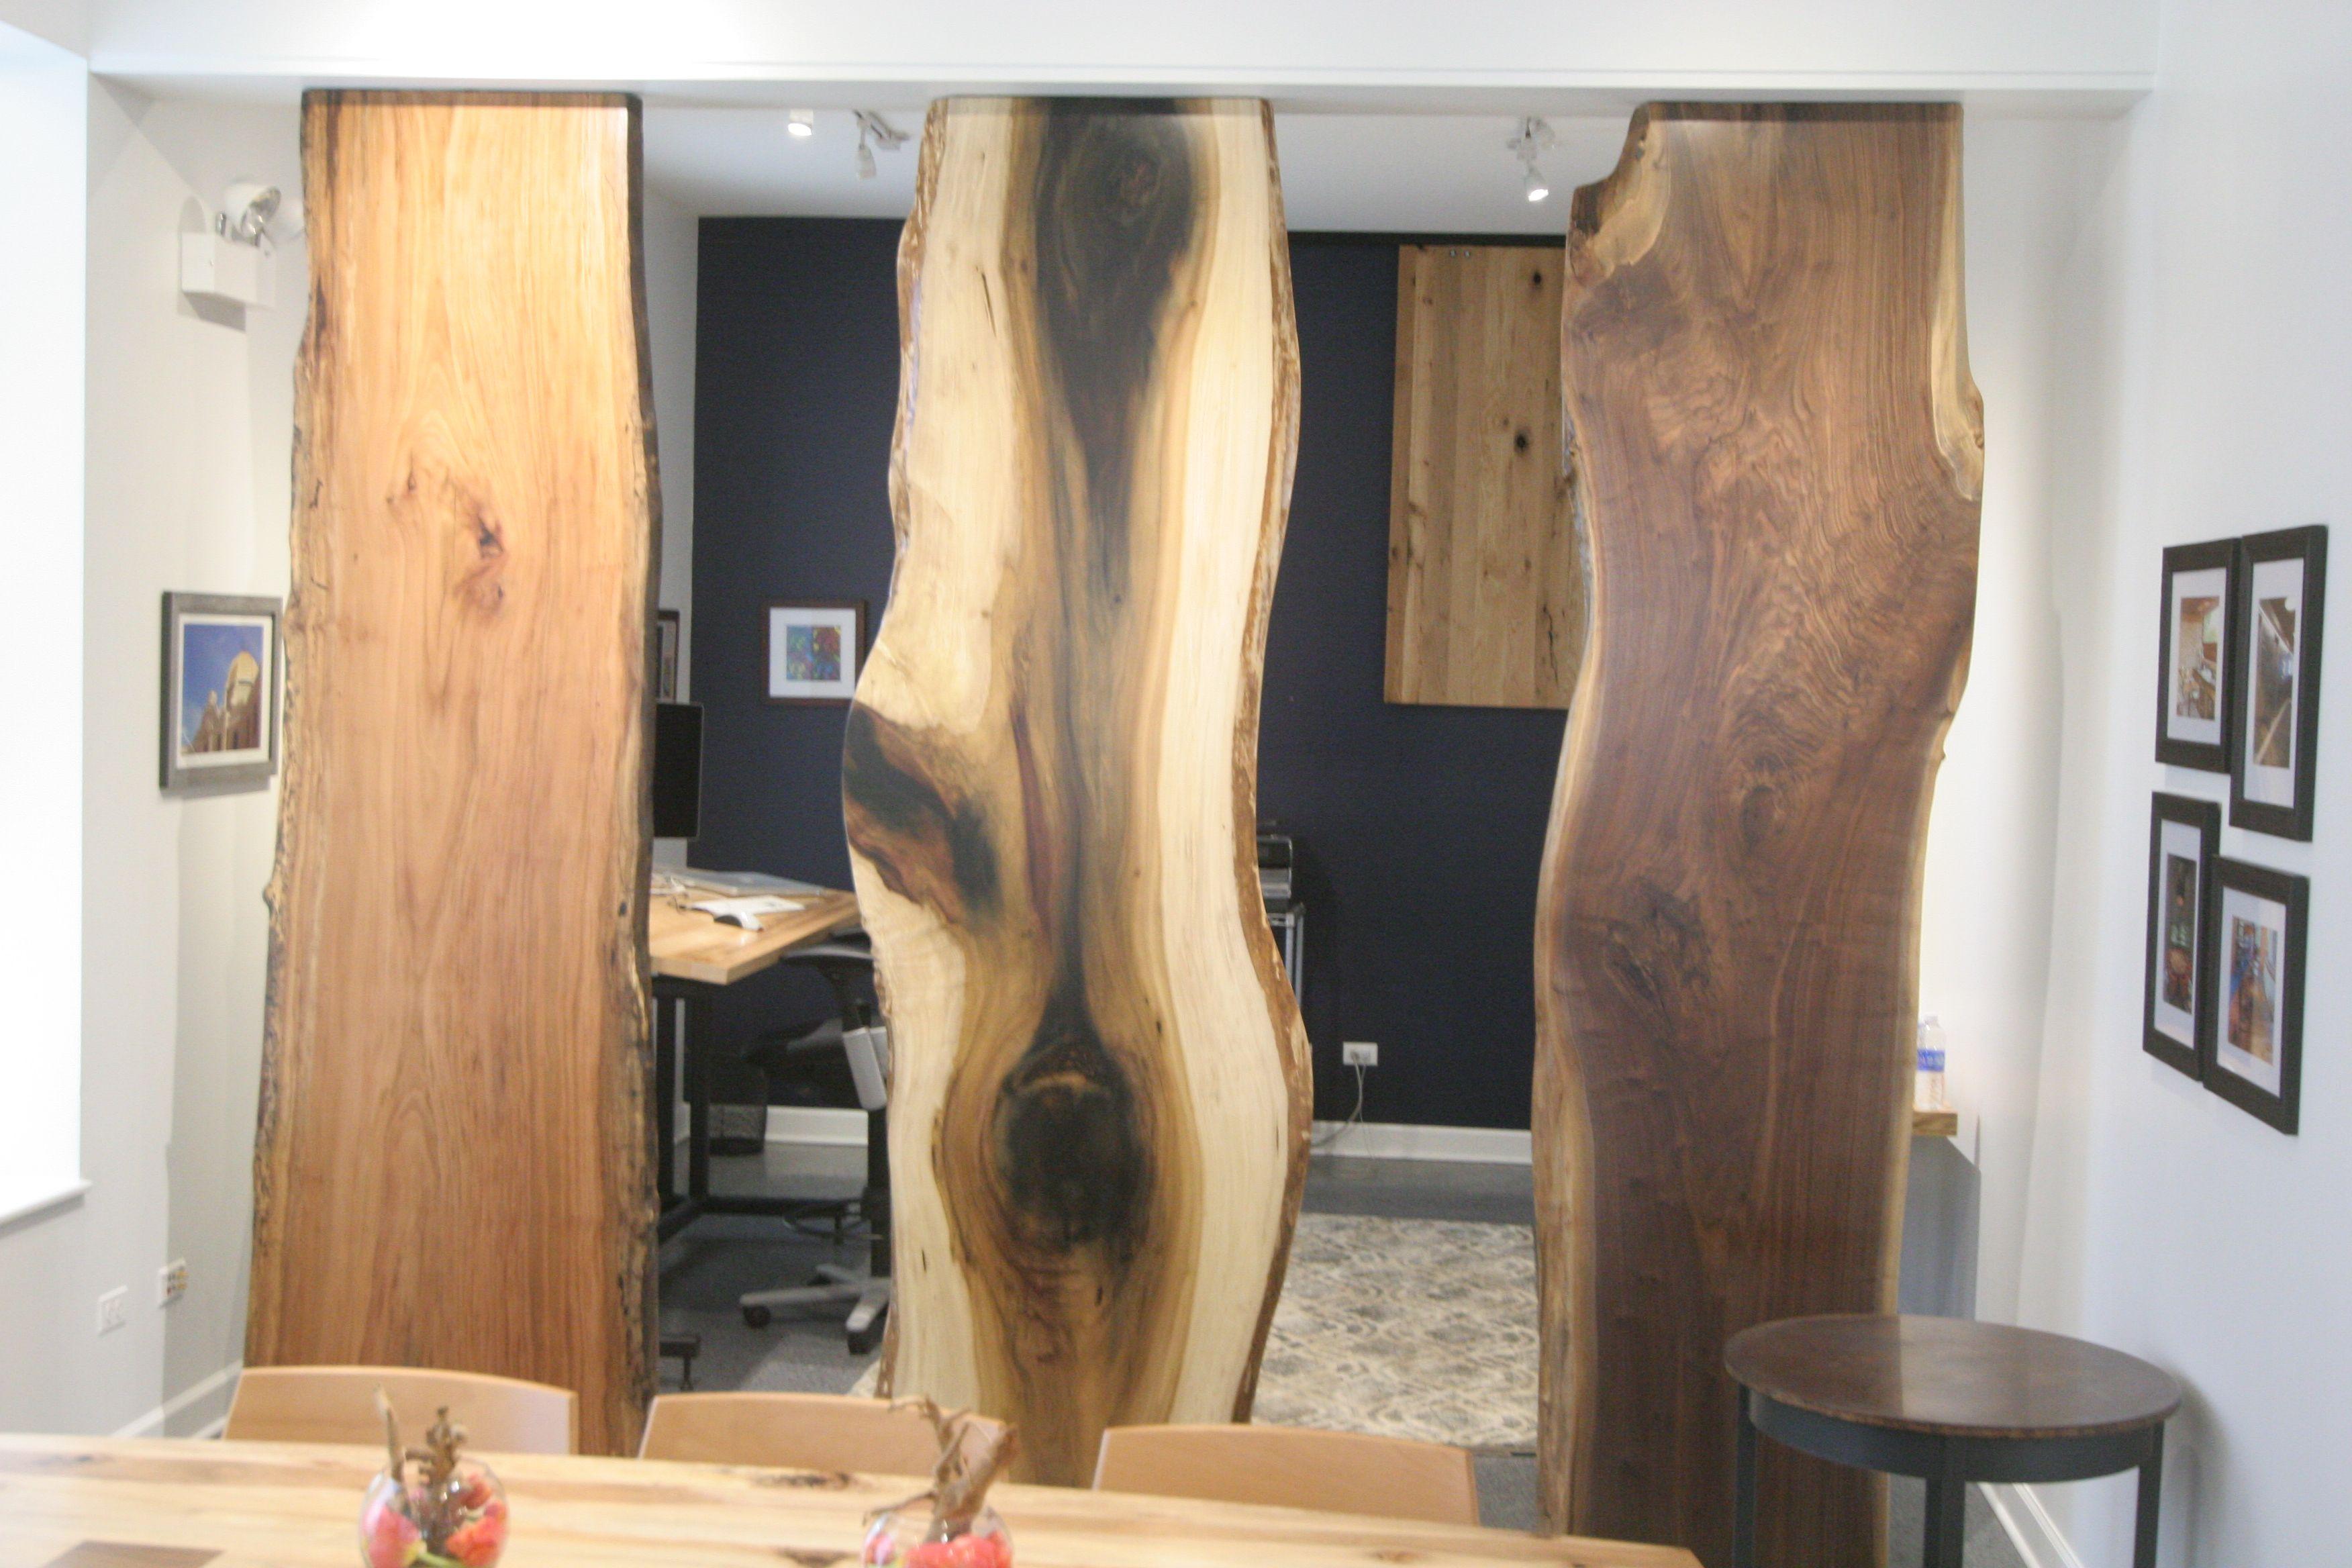 Sycamore, rainbow poplar and walnut slabs used vertically as